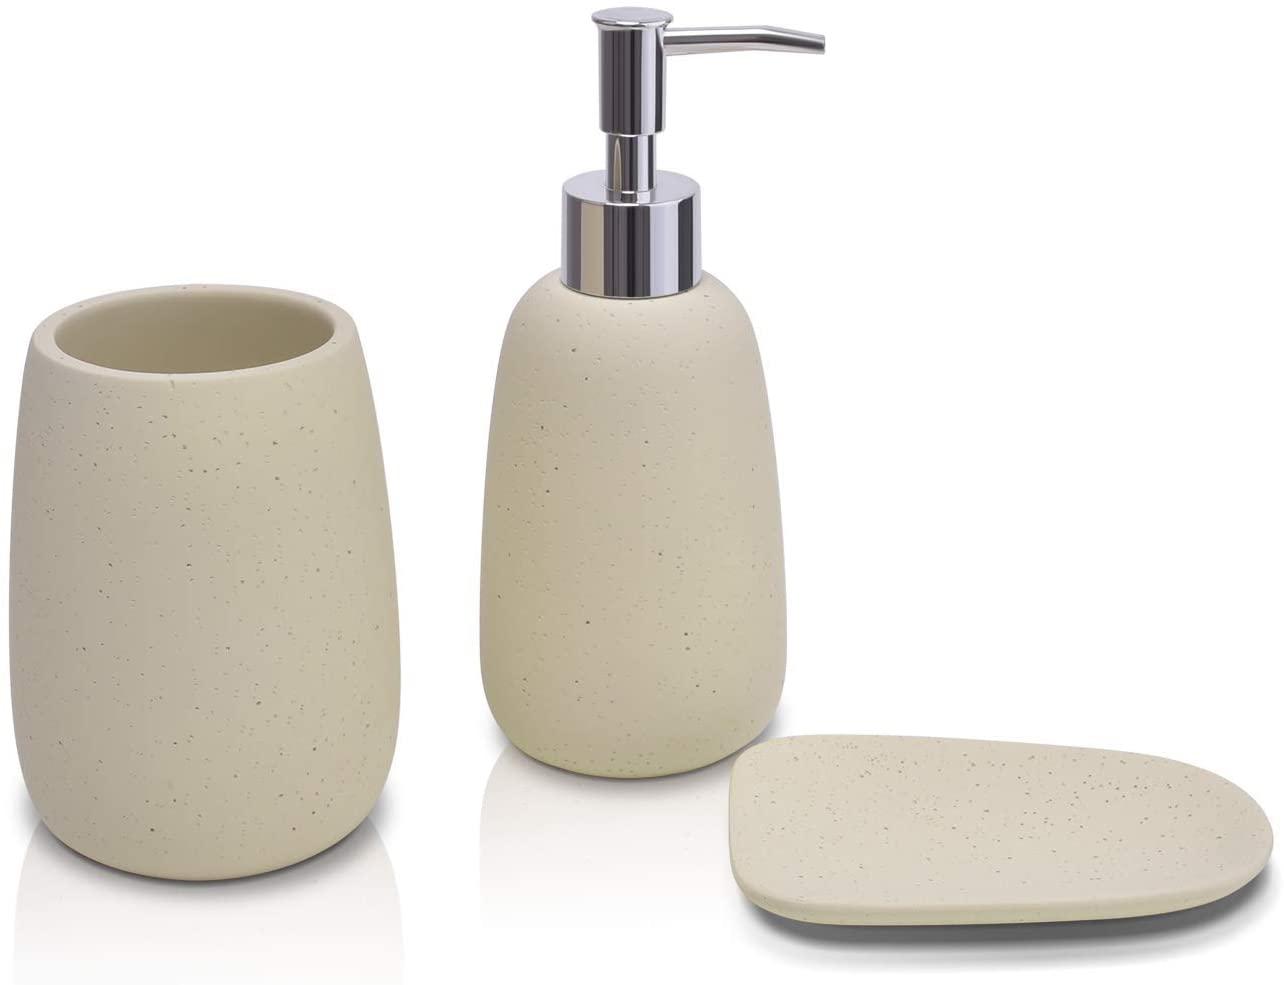 Bathroom Accessory Set Beige 3 Pieces Includes Bathroom Soap Dispenser, Bathroom Tumbler, Soap Dish